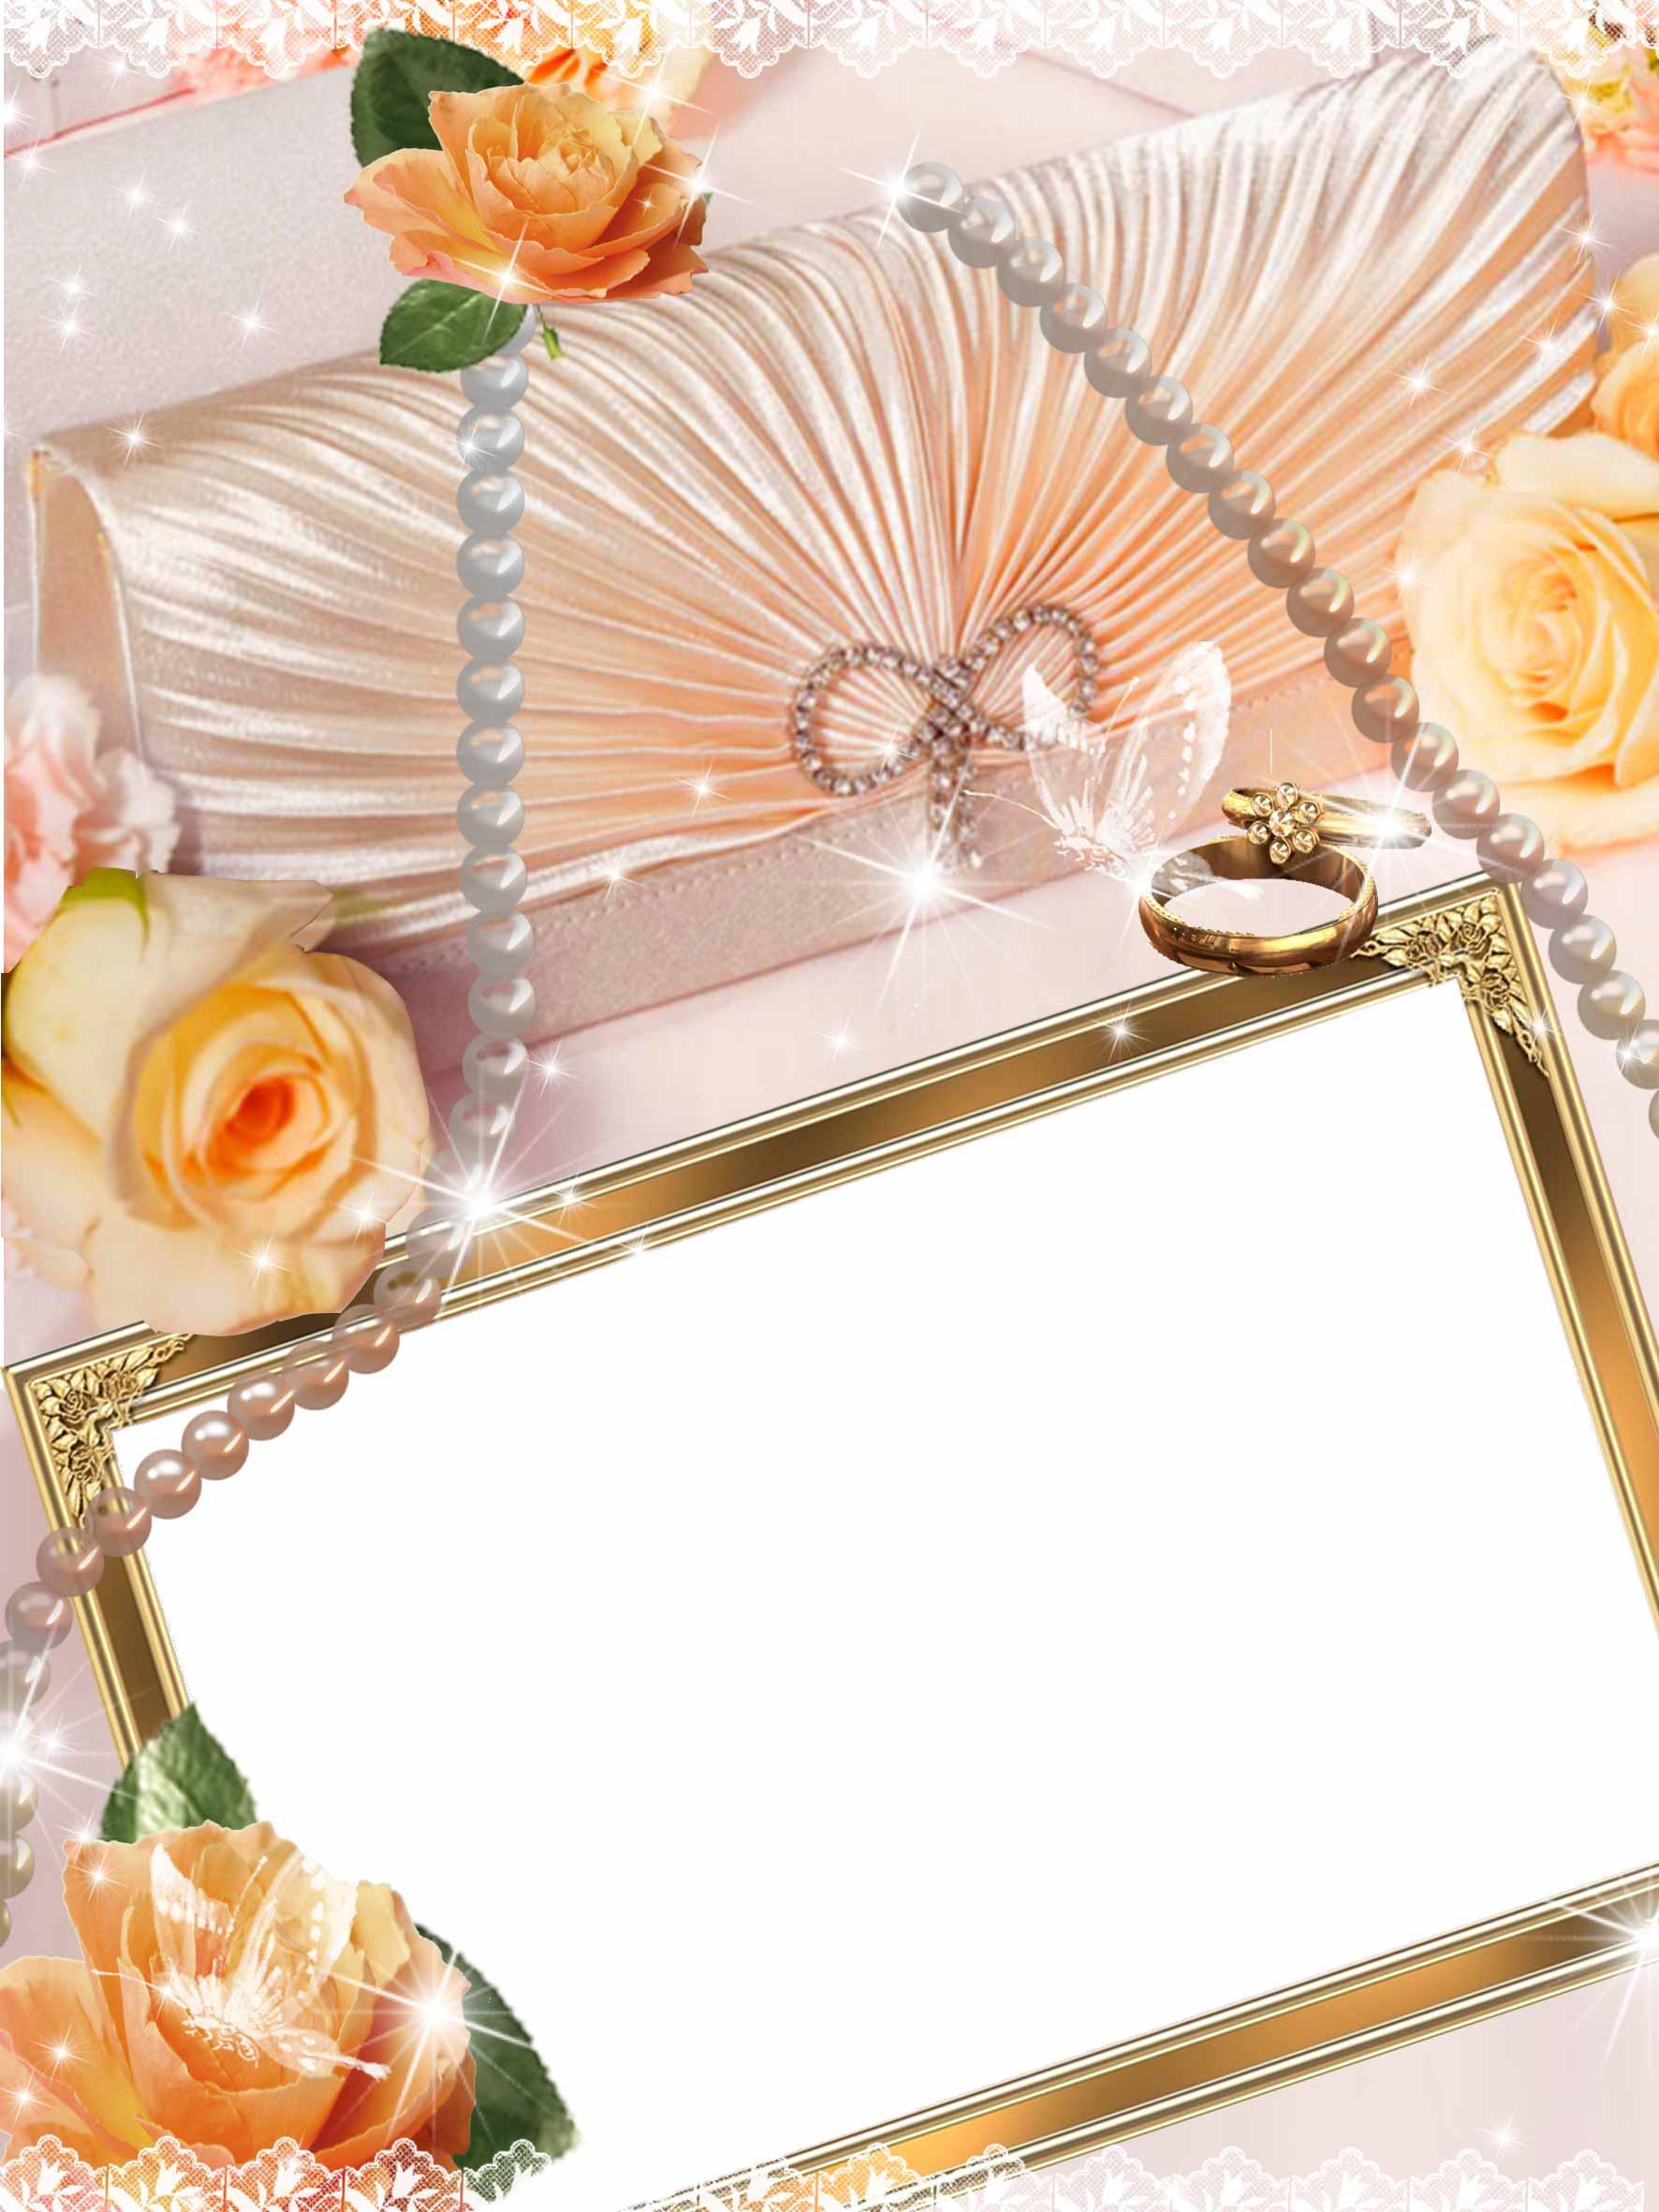 Открытки и рамки на свадебные фото